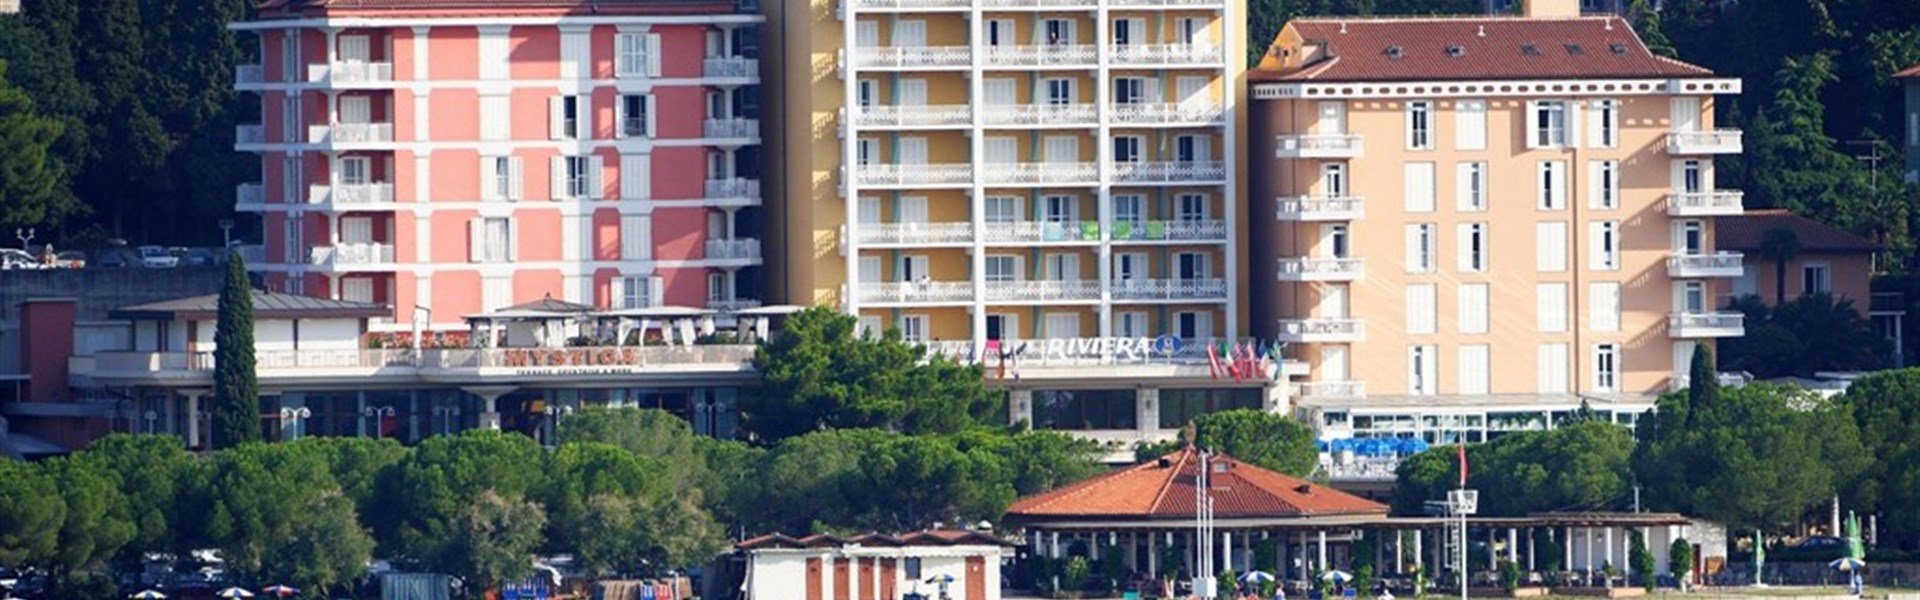 Life Class Hotel Riviera -